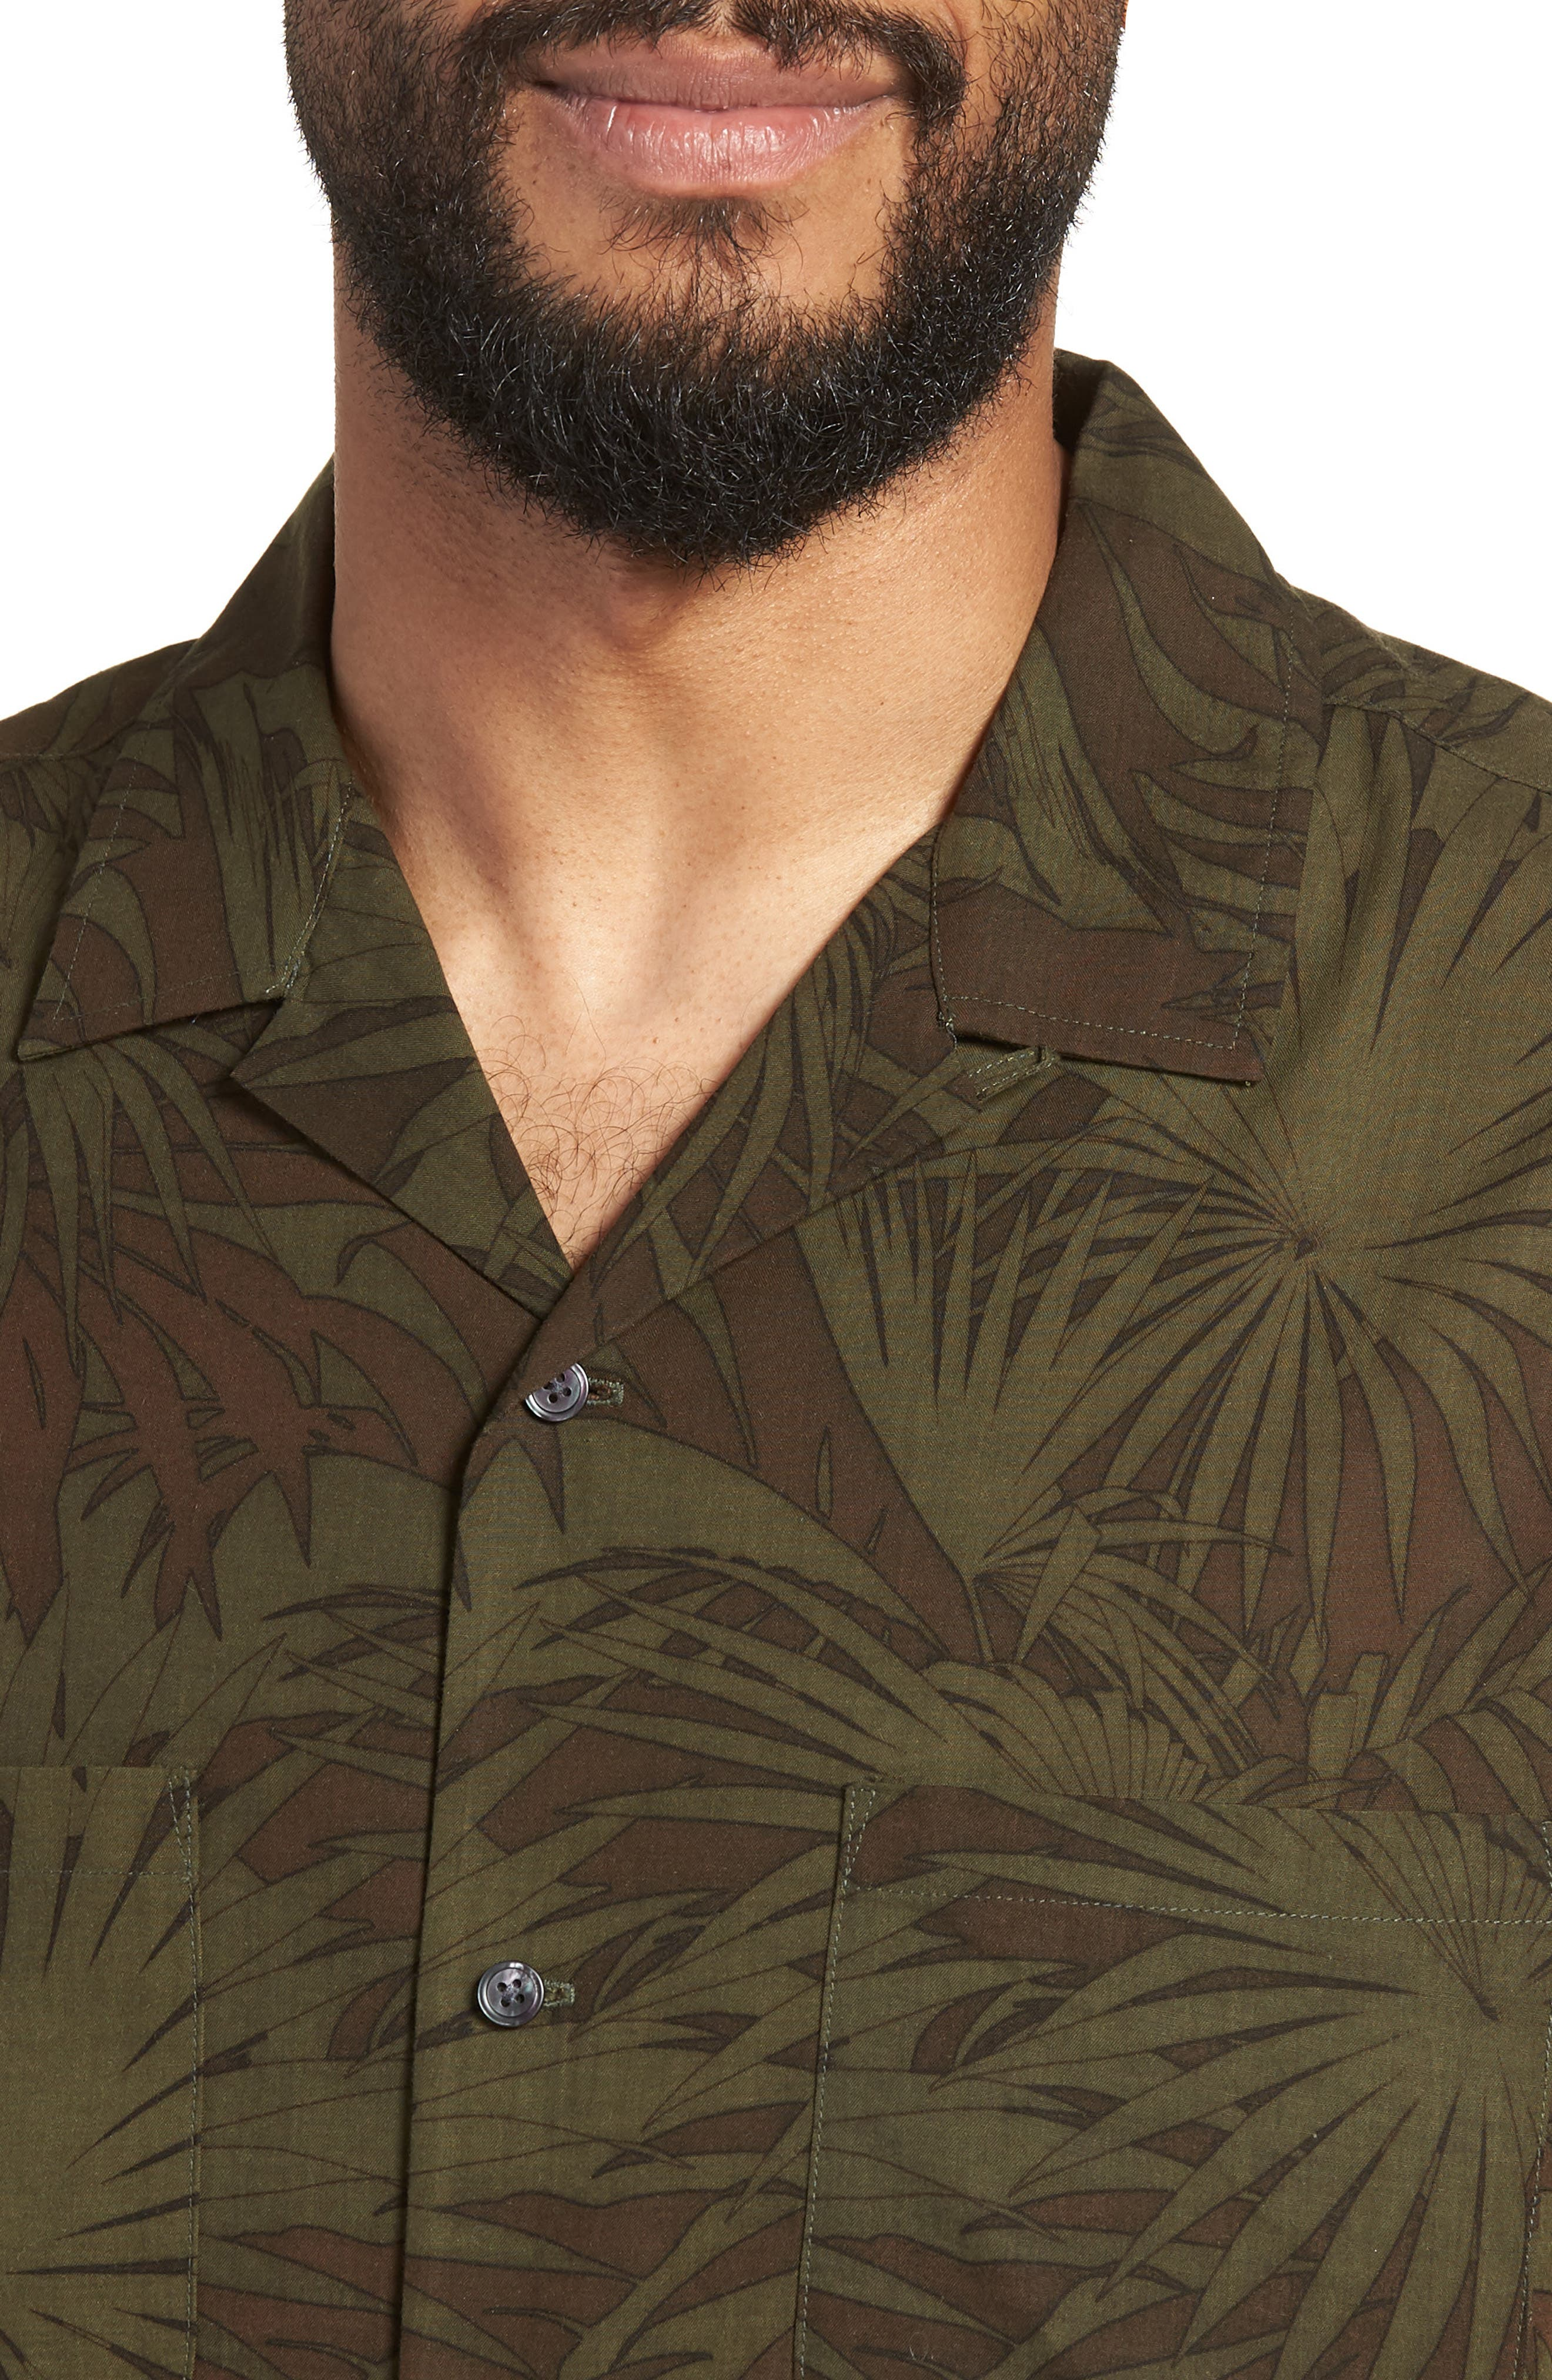 Palm Leaf Cabana Woven Shirt,                             Alternate thumbnail 4, color,                             FOLIAGE/ DRIED HERB